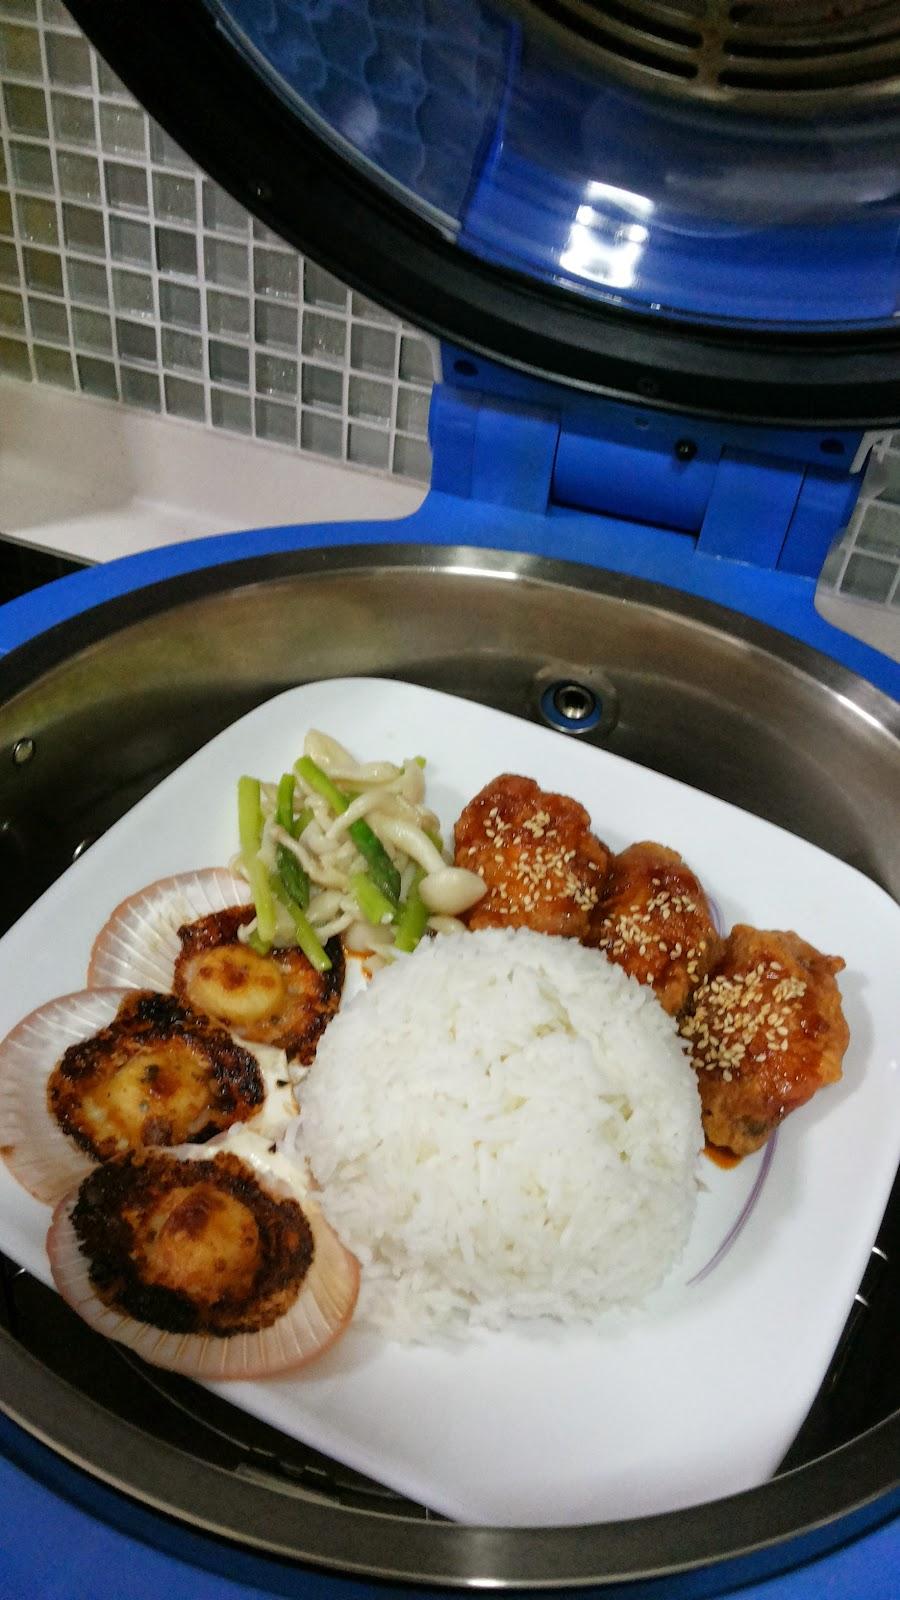 Krystal Wee Recipes Buffalo Smart Air Fryer Review